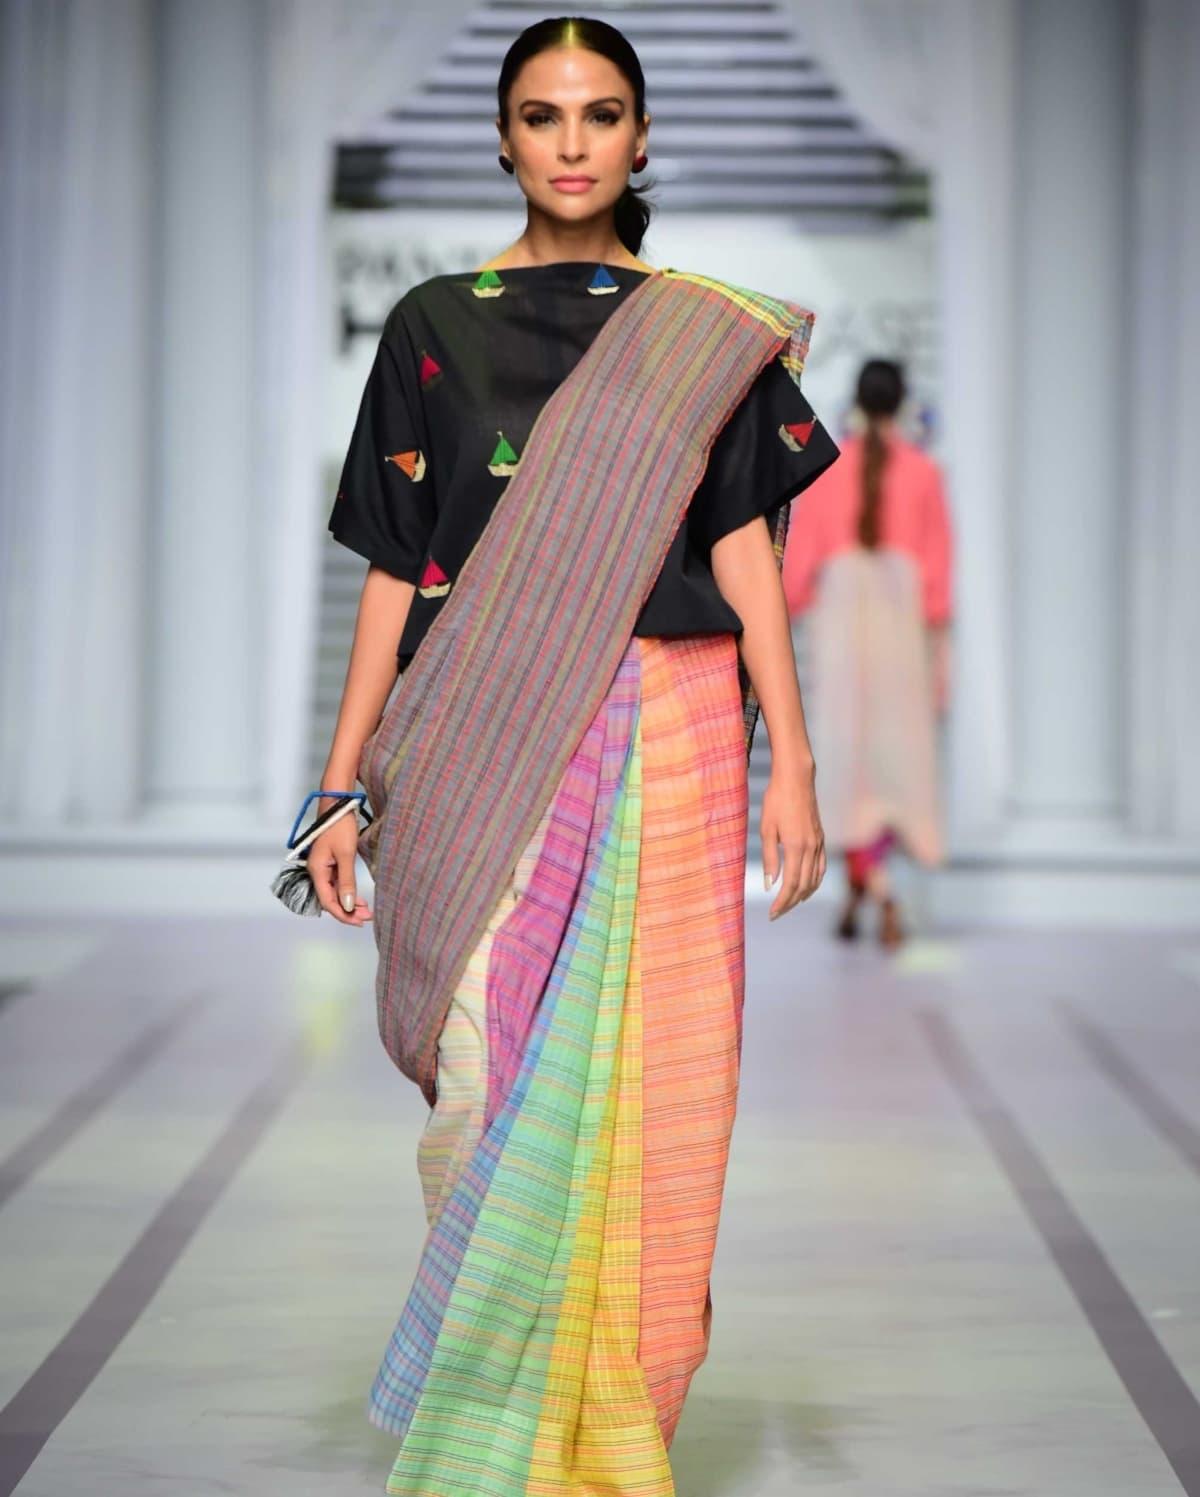 This sari modelled by Fouzia Aman was a hit!